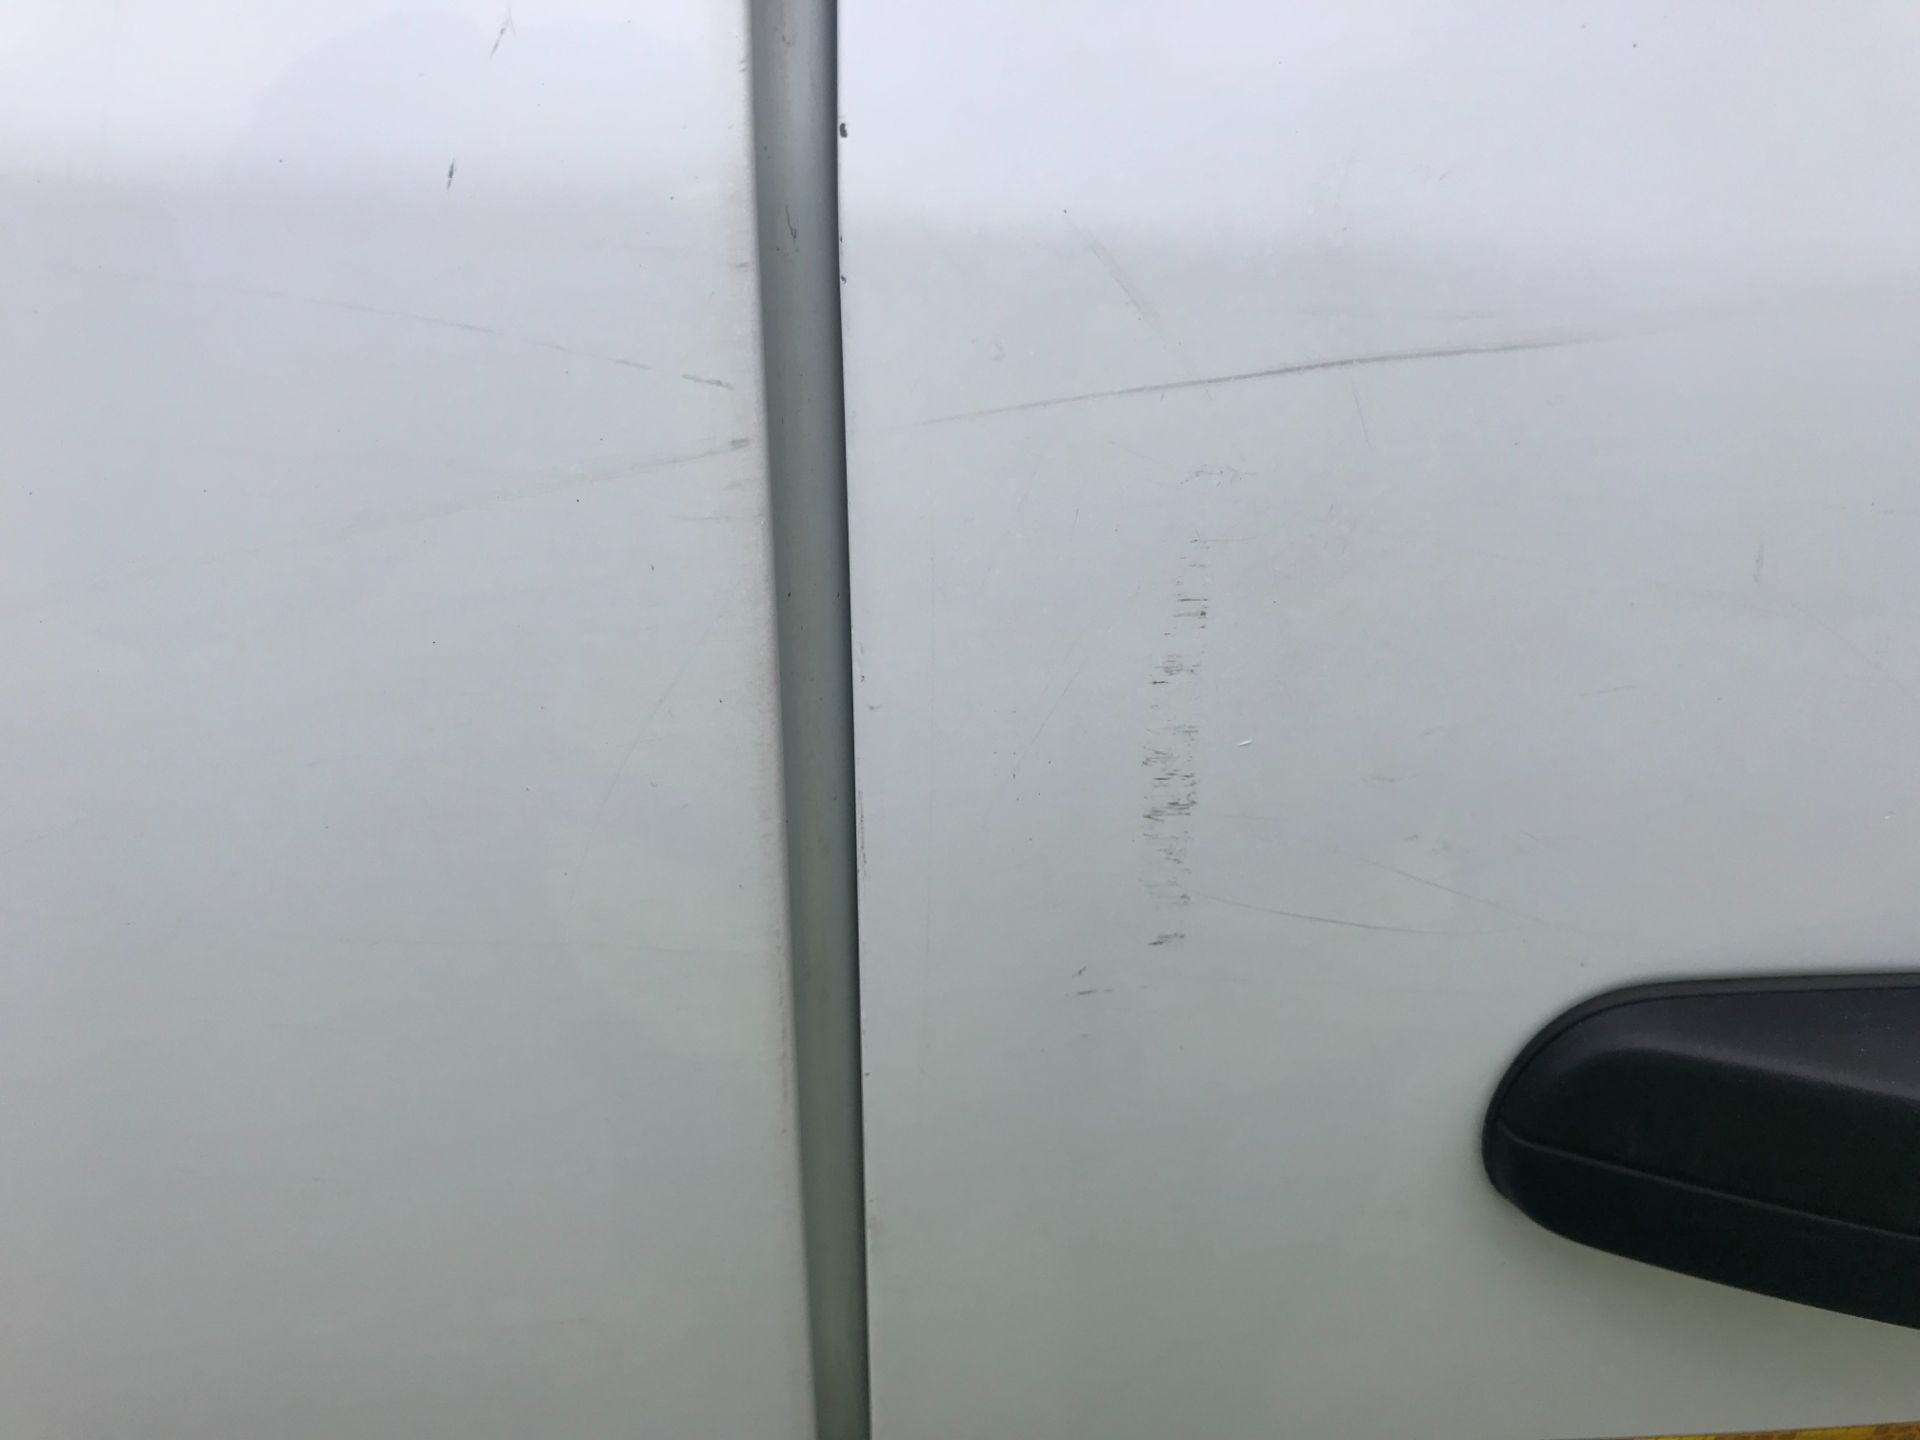 2018 Ford Transit 2.0 Tdci 130 L2 H2 EURO 6 (FG18YJM) Image 36